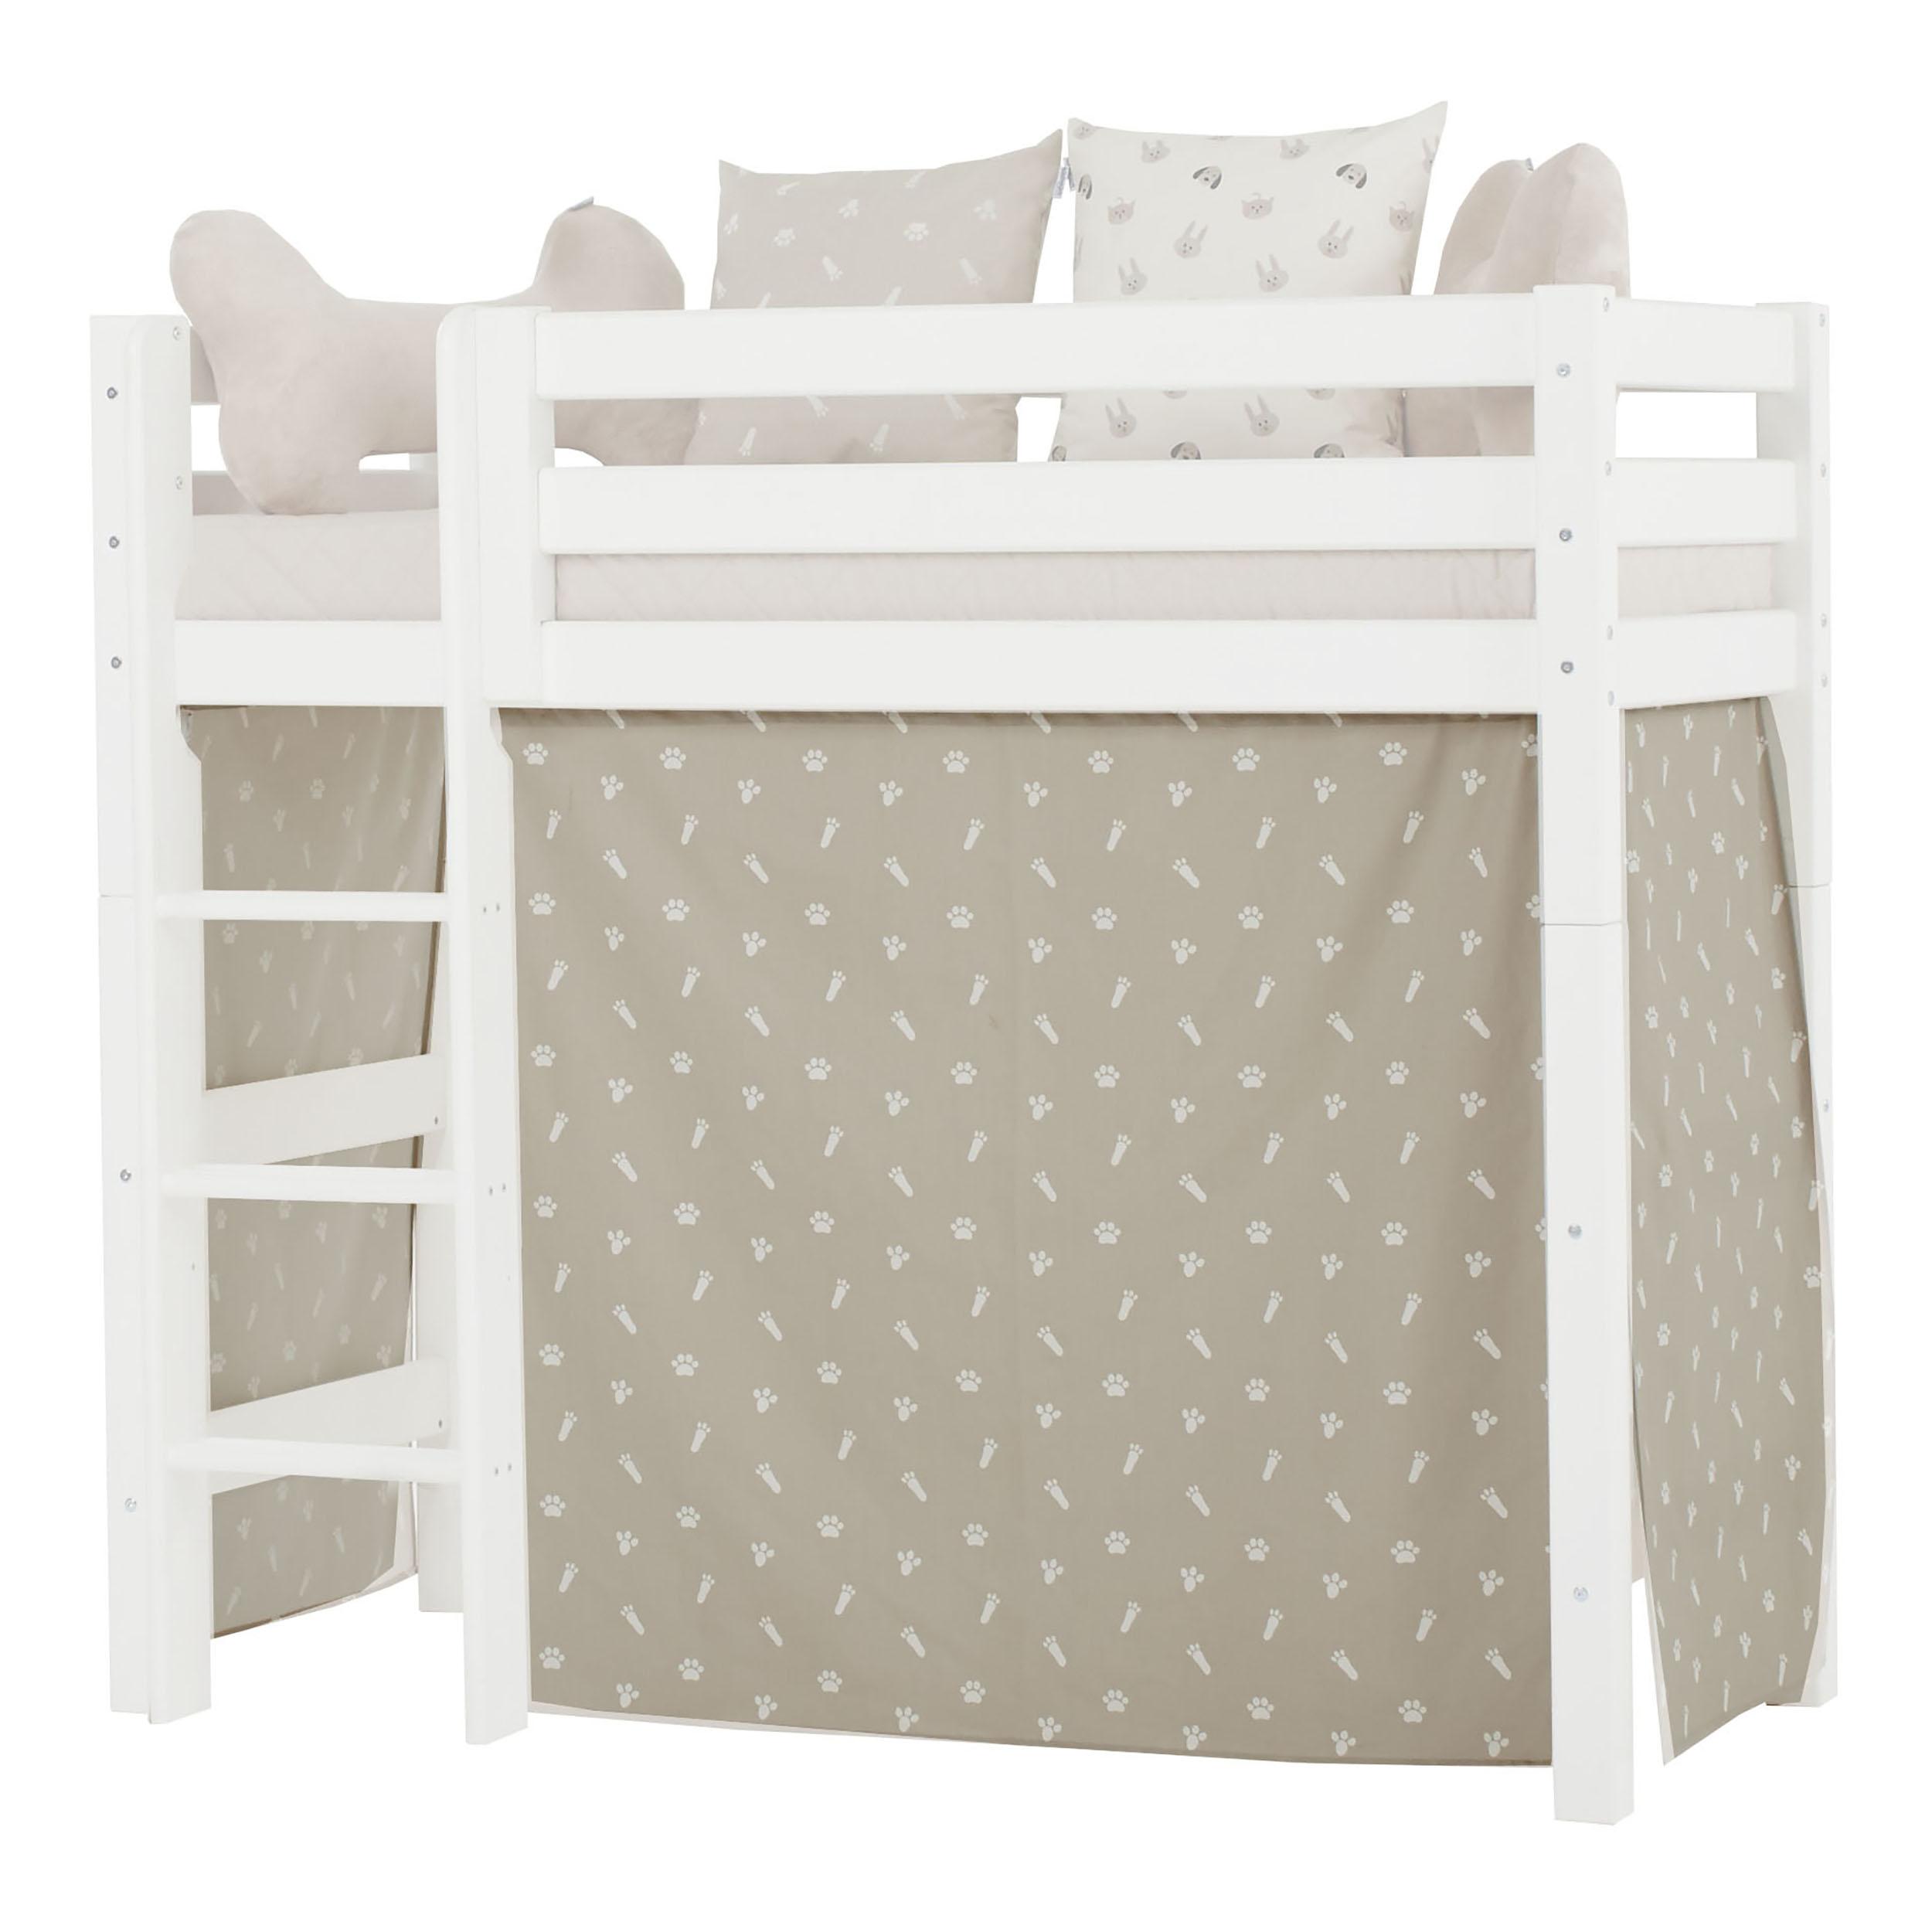 Hoppekids - Play Curtain Mid-High Bed 70x160 cm - Pets Silver Cloud